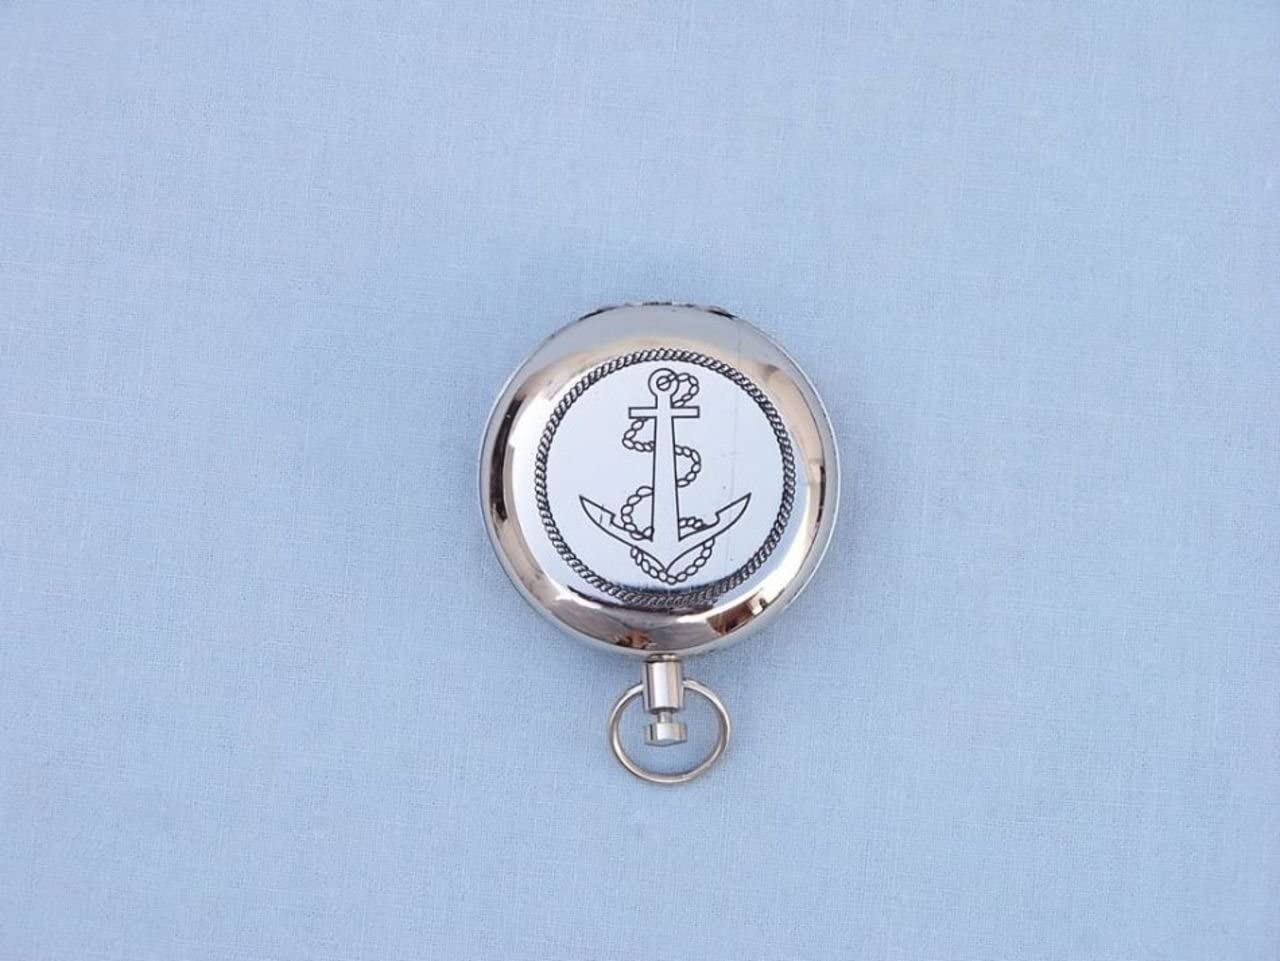 Antique Copper Hampton Nautical  CO-0902-AC Anchor Scouts Push Button Compass 2